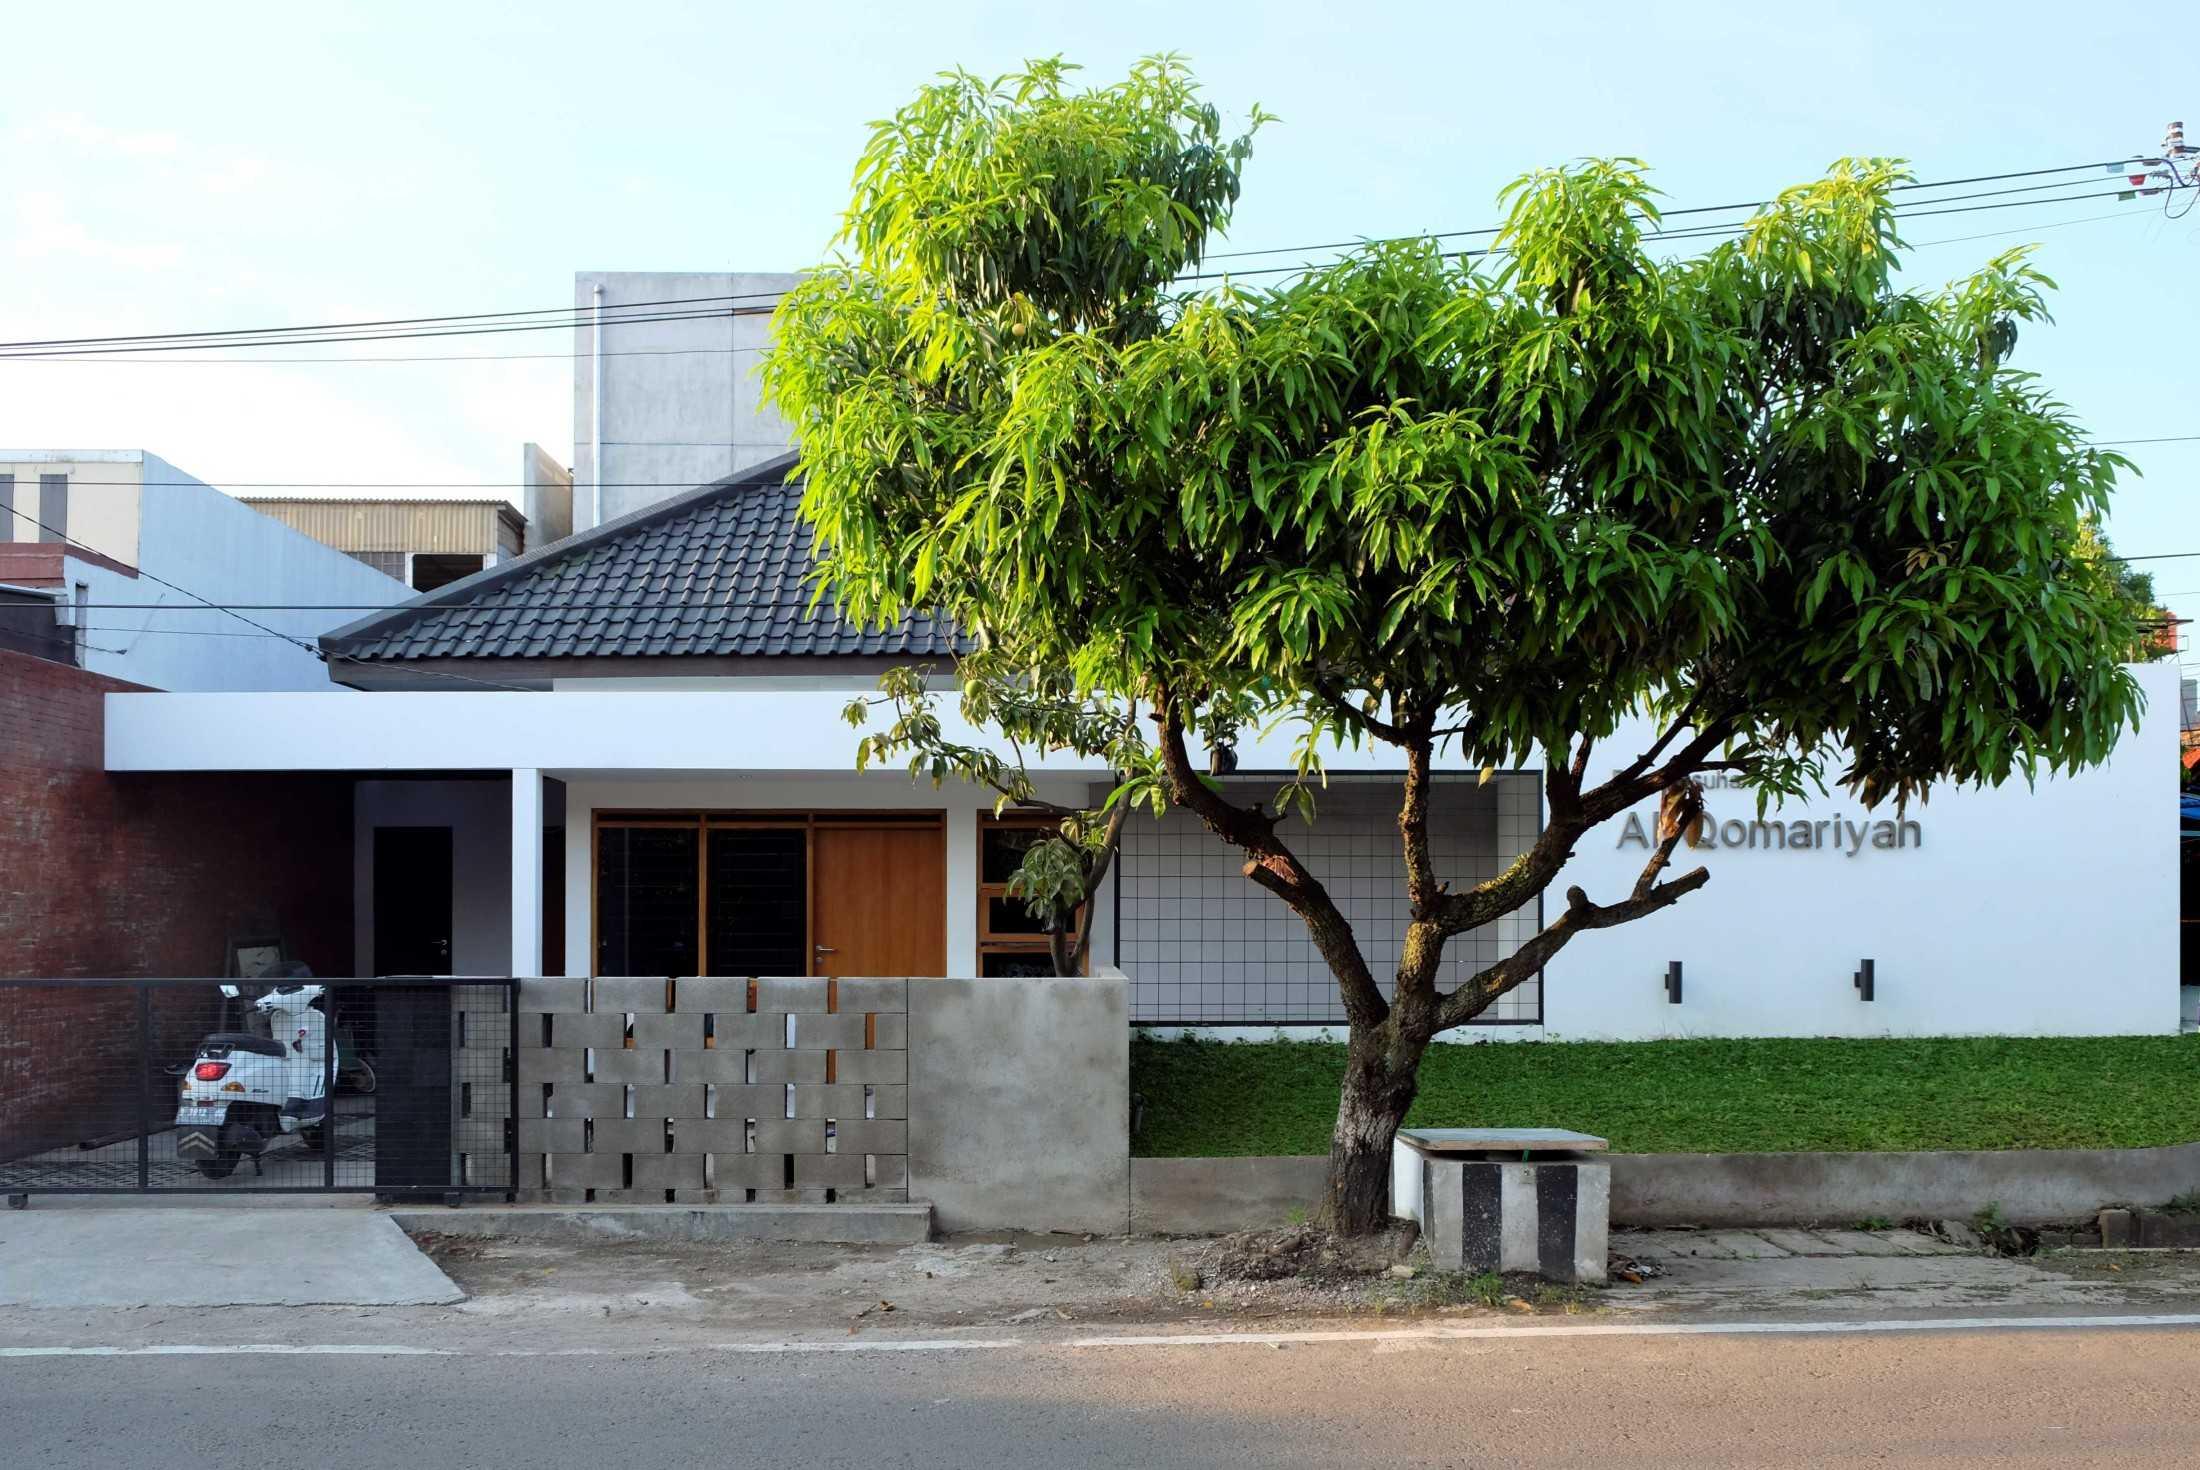 Eki Achmad Rujai Al-Qomariyah Orphanage Bandung, Kota Bandung, Jawa Barat, Indonesia Bandung, Kota Bandung, Jawa Barat, Indonesia 66666  66666